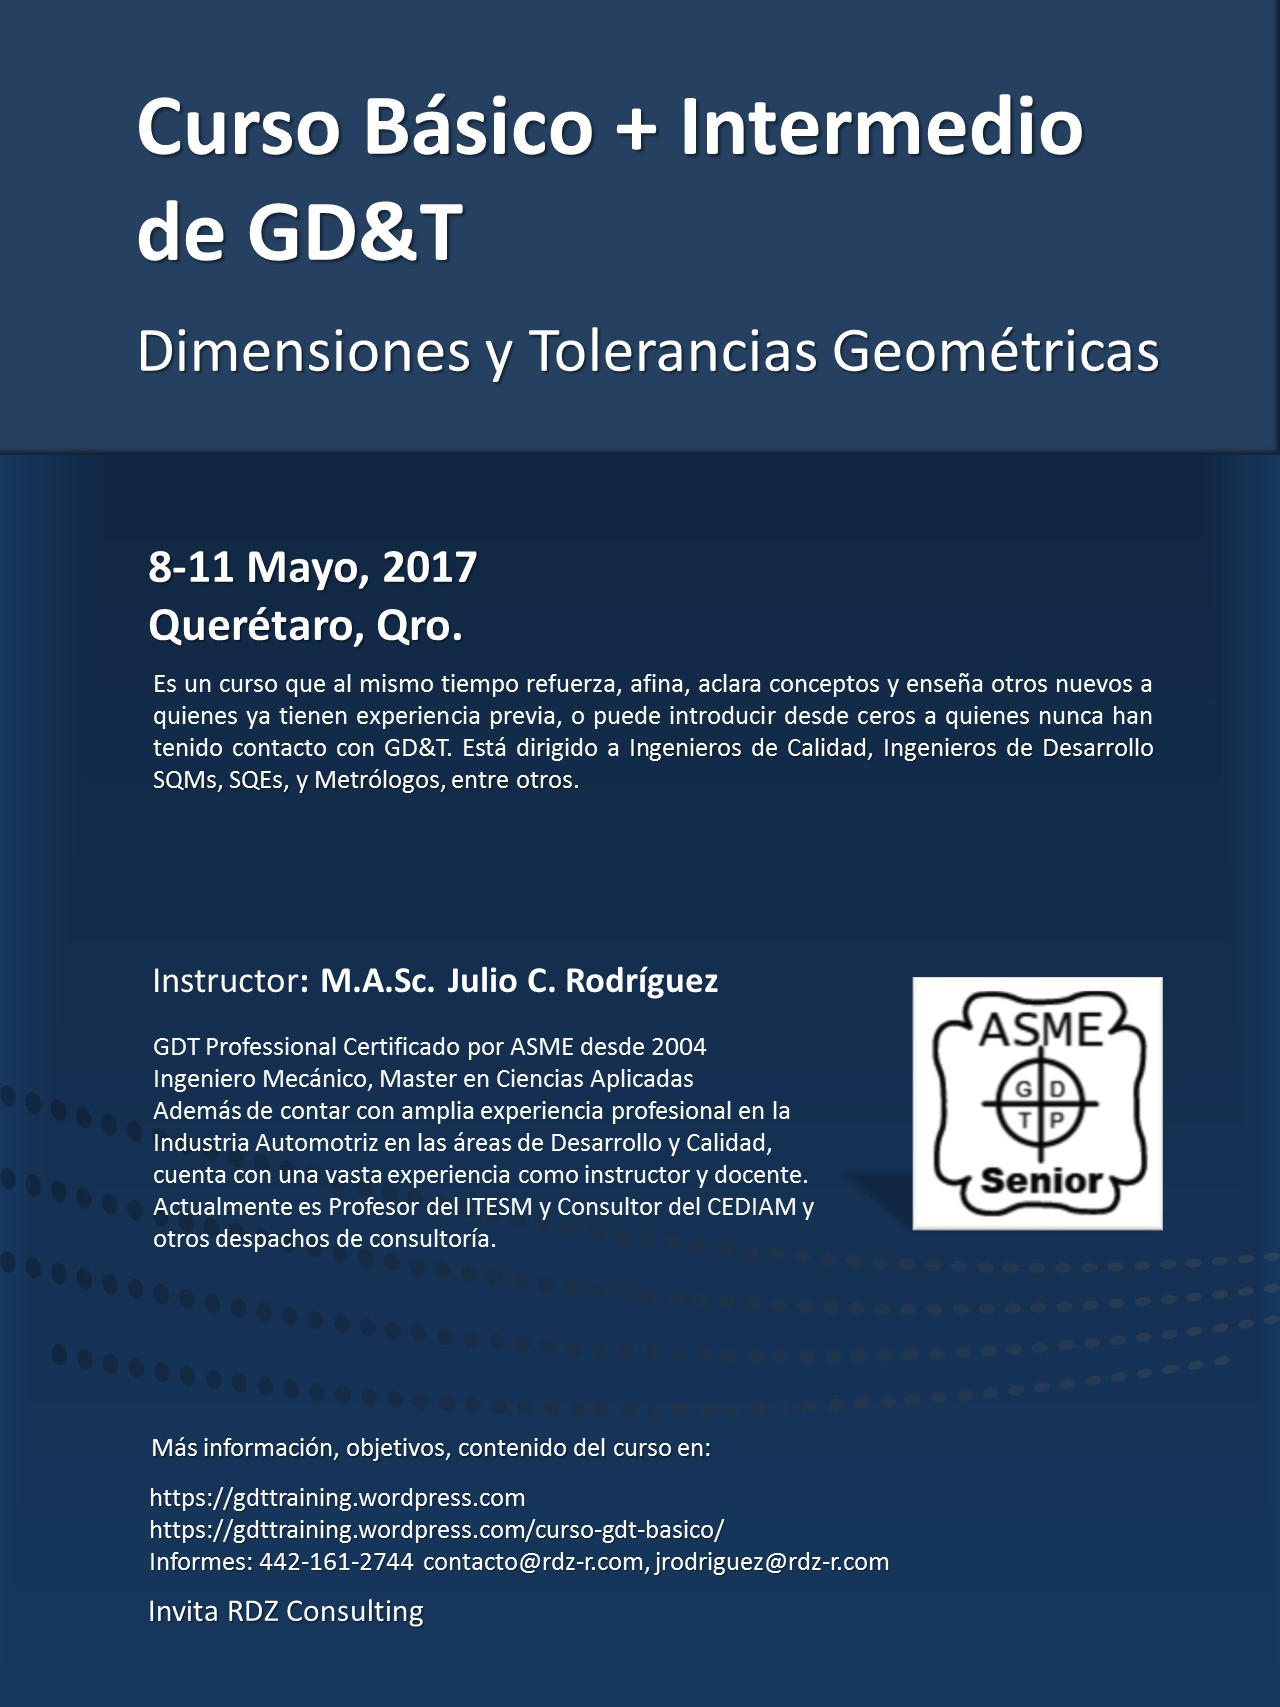 Banner Curso Básico GD&T v2.jpg